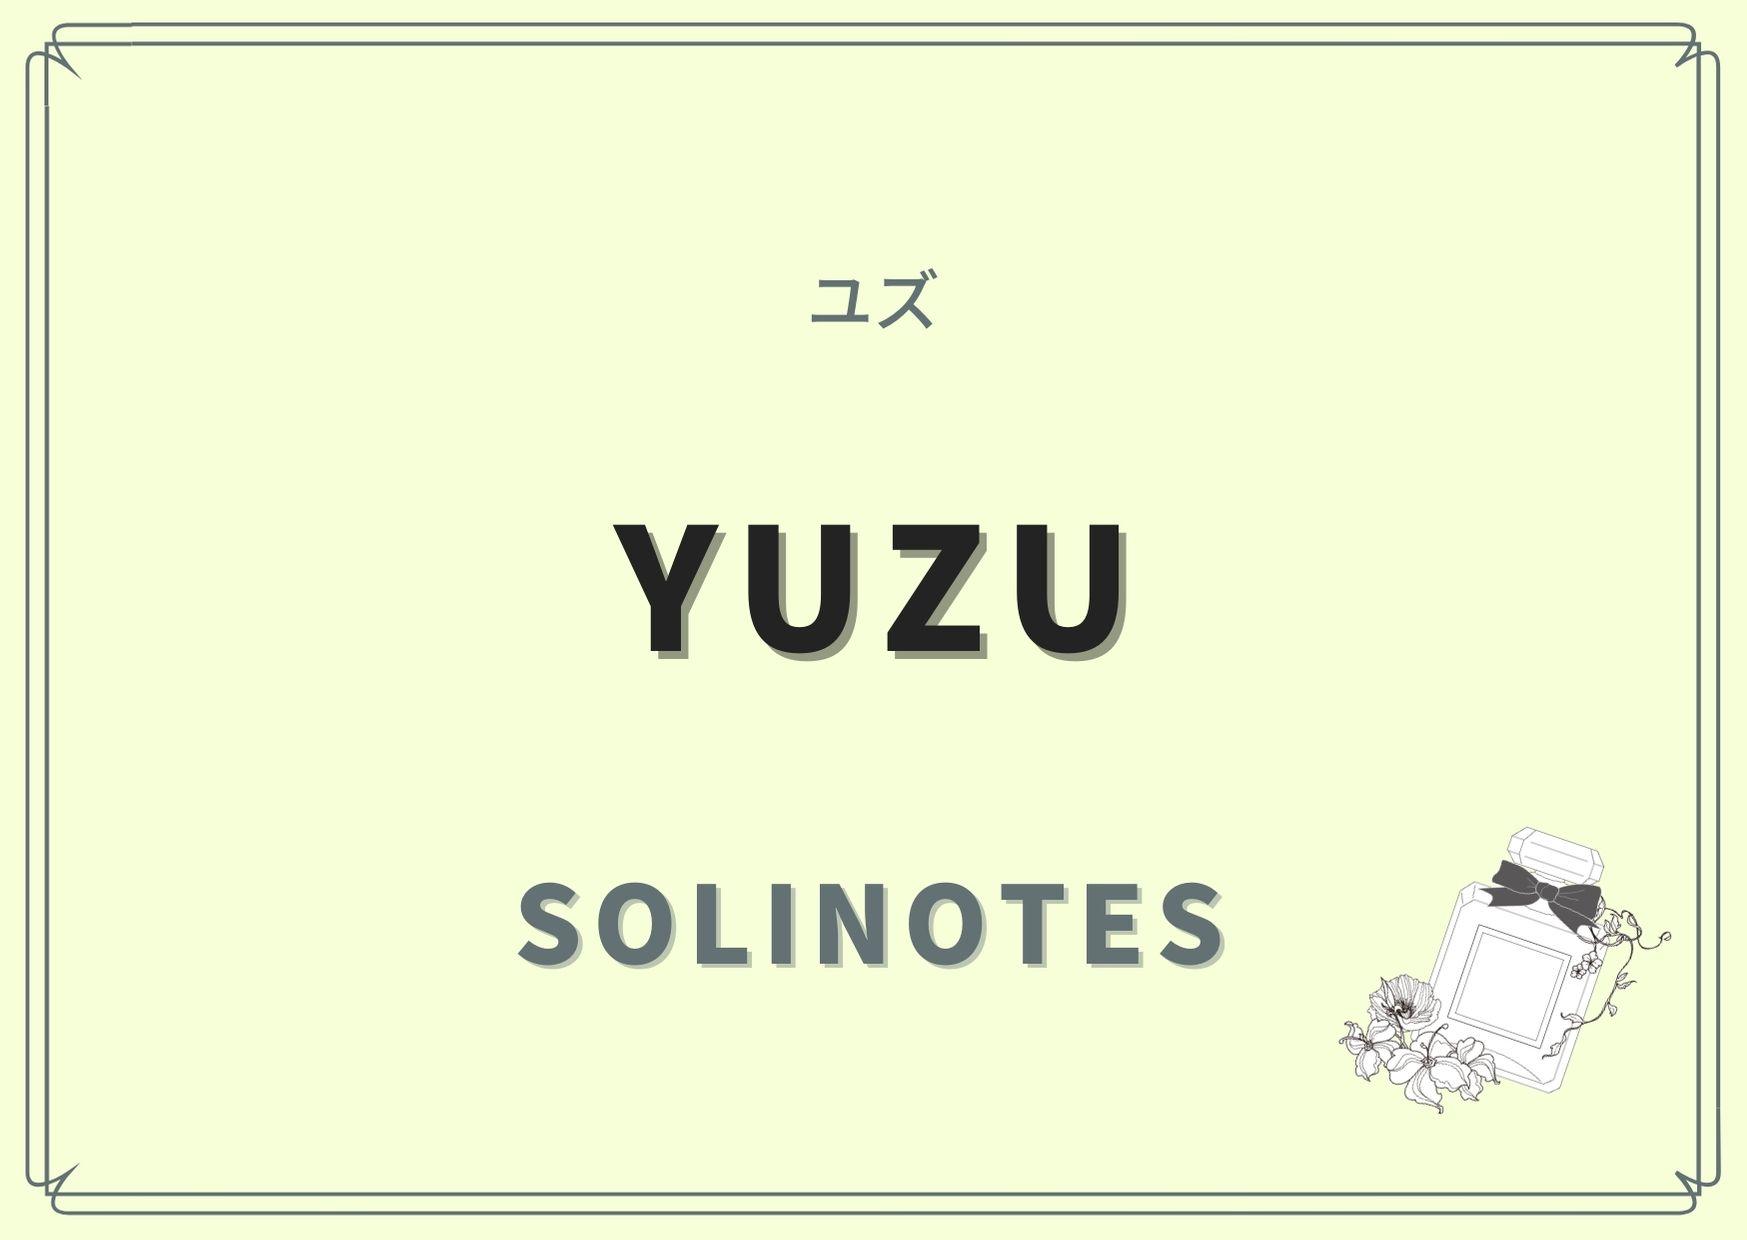 YUZU(ユズ)/solinotes(ソリノート)